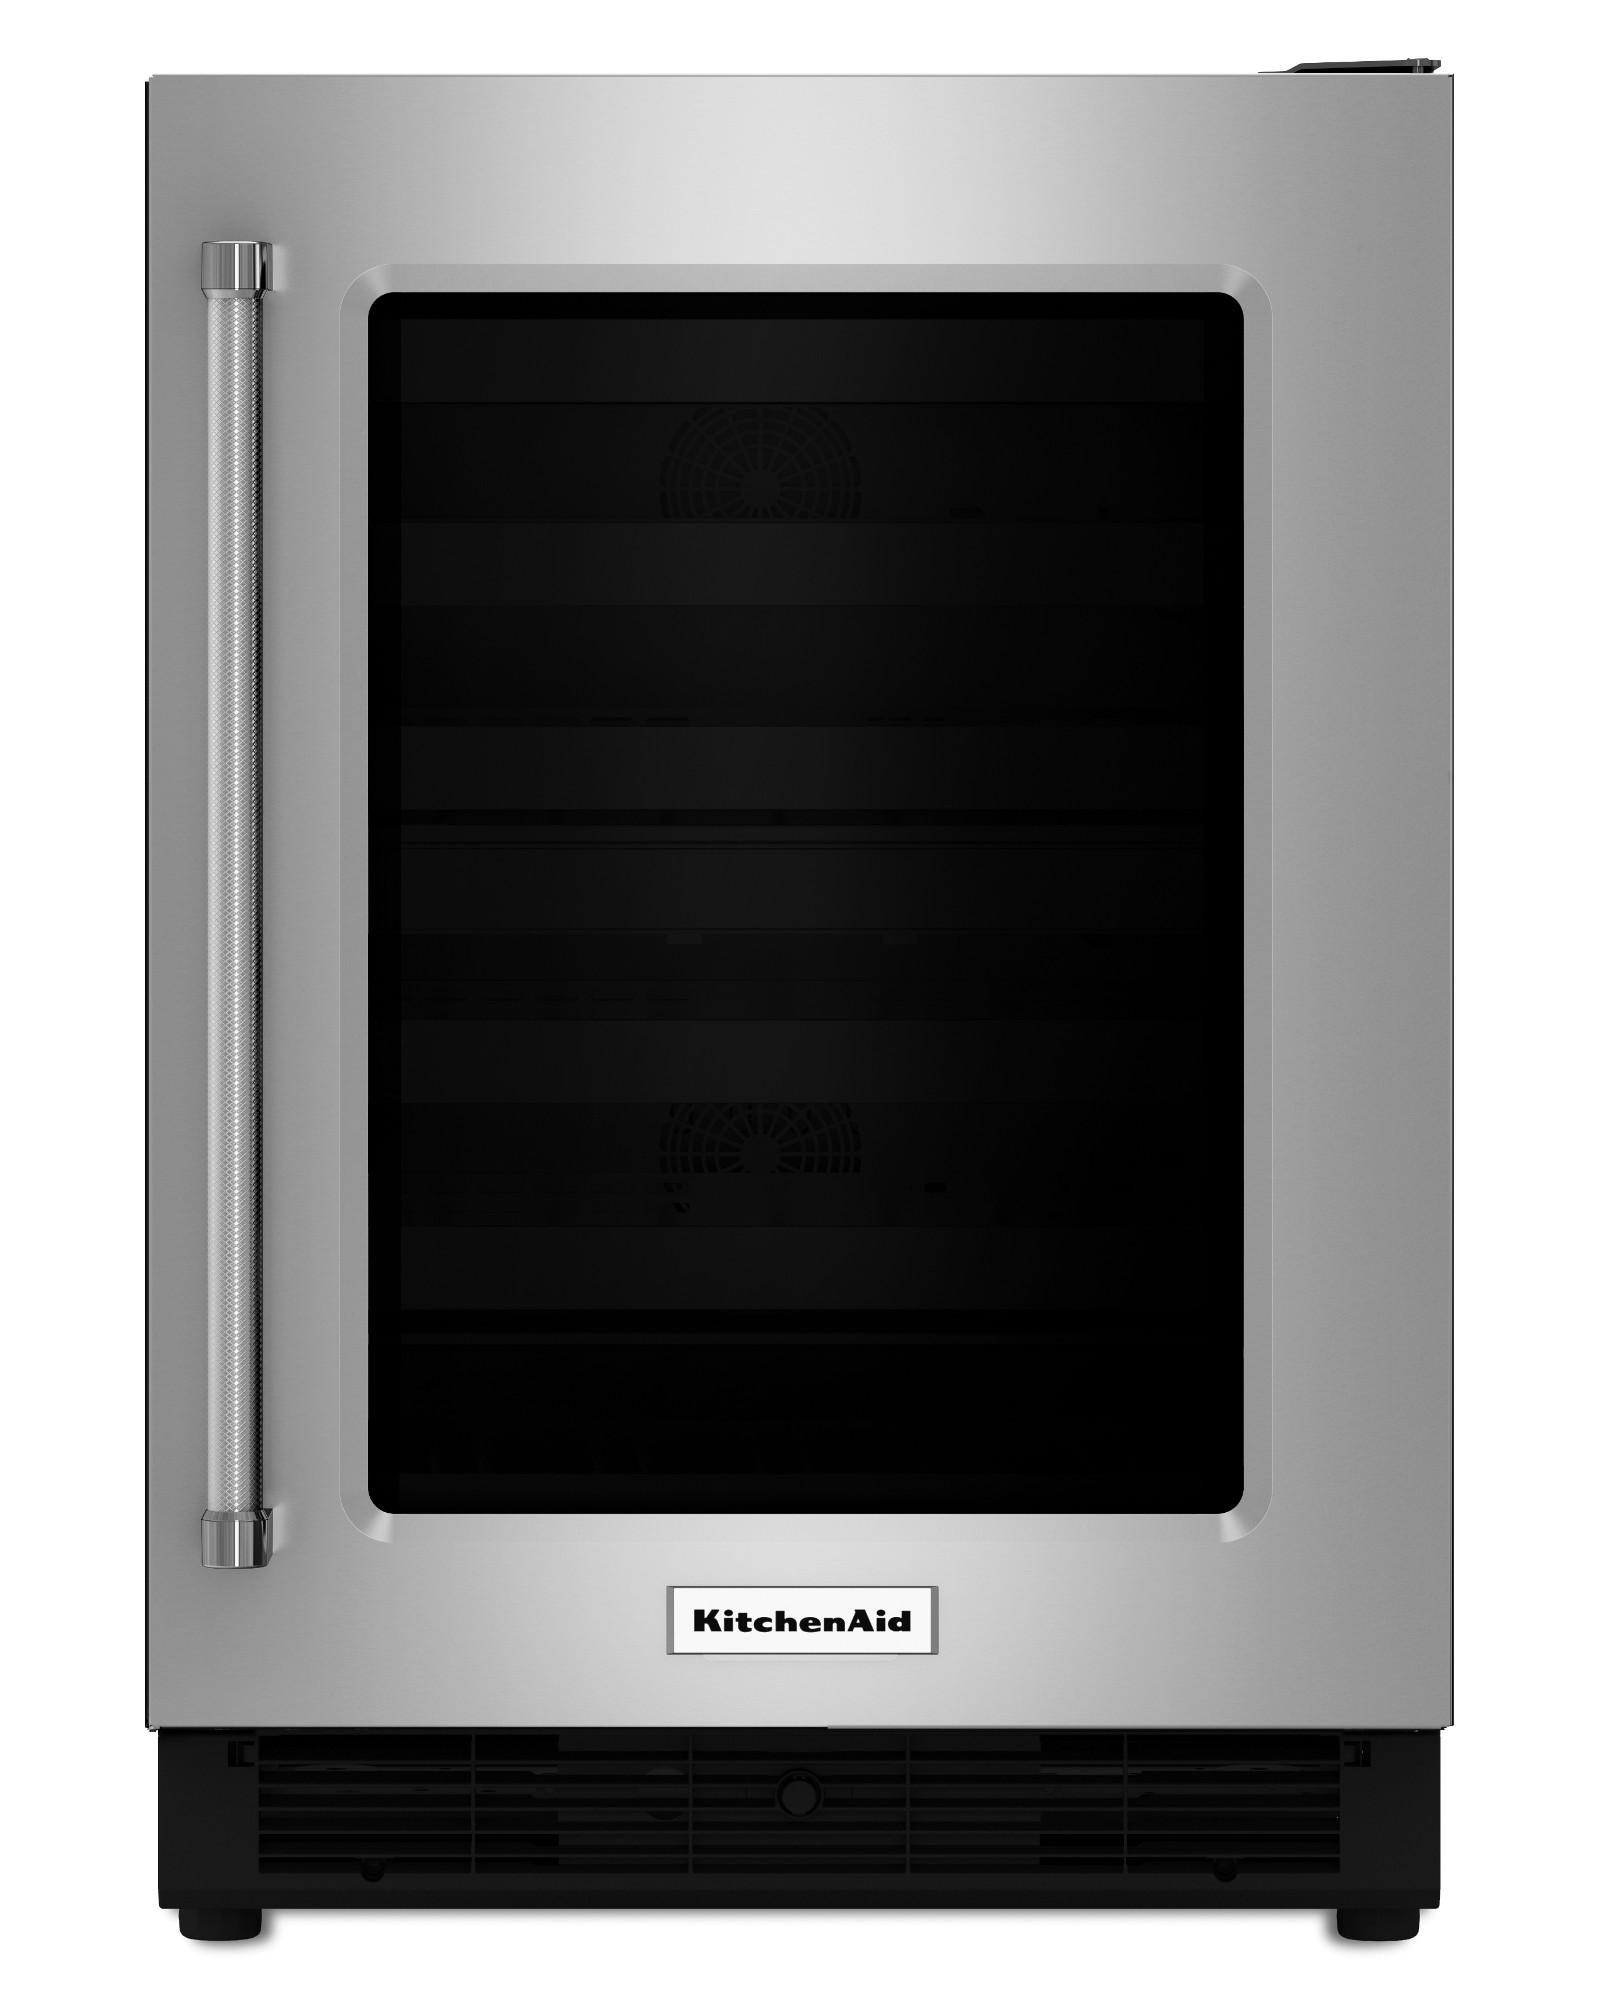 KitchenAid KURR204ESB 5.1 cu. ft. Right Swing Undercounter Refrigerator w/ Glass Door - Stainless Steel